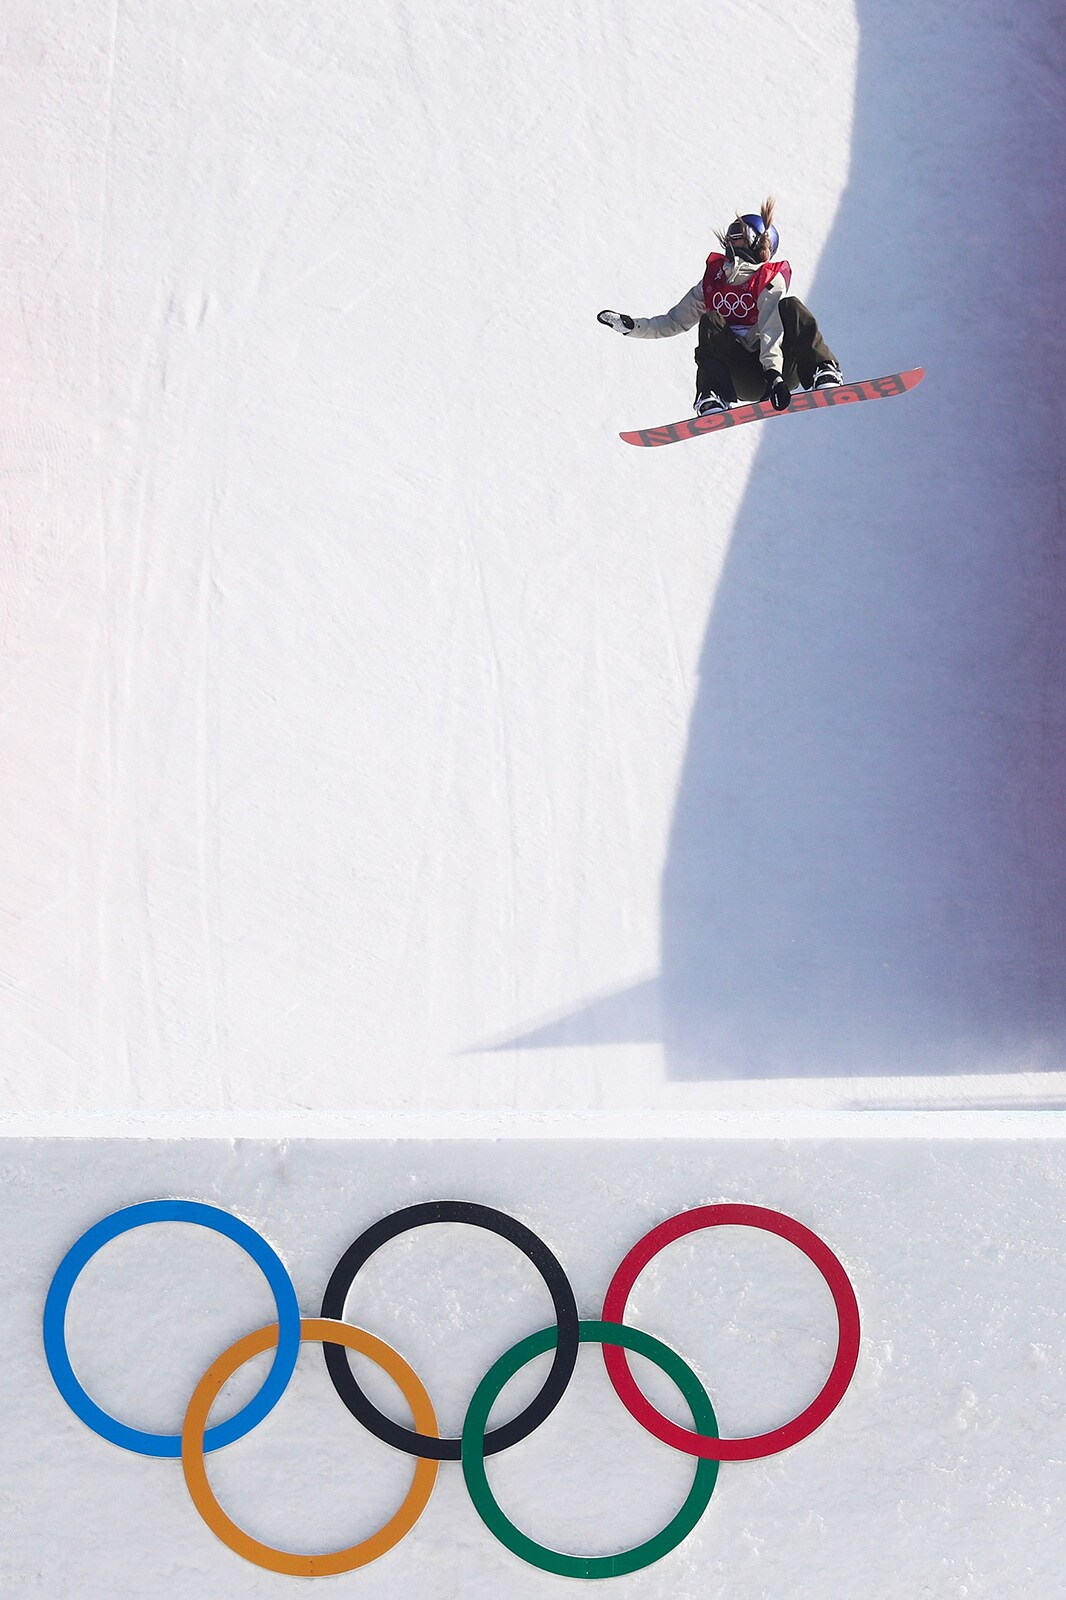 Snowboard - Ladies' Big Air